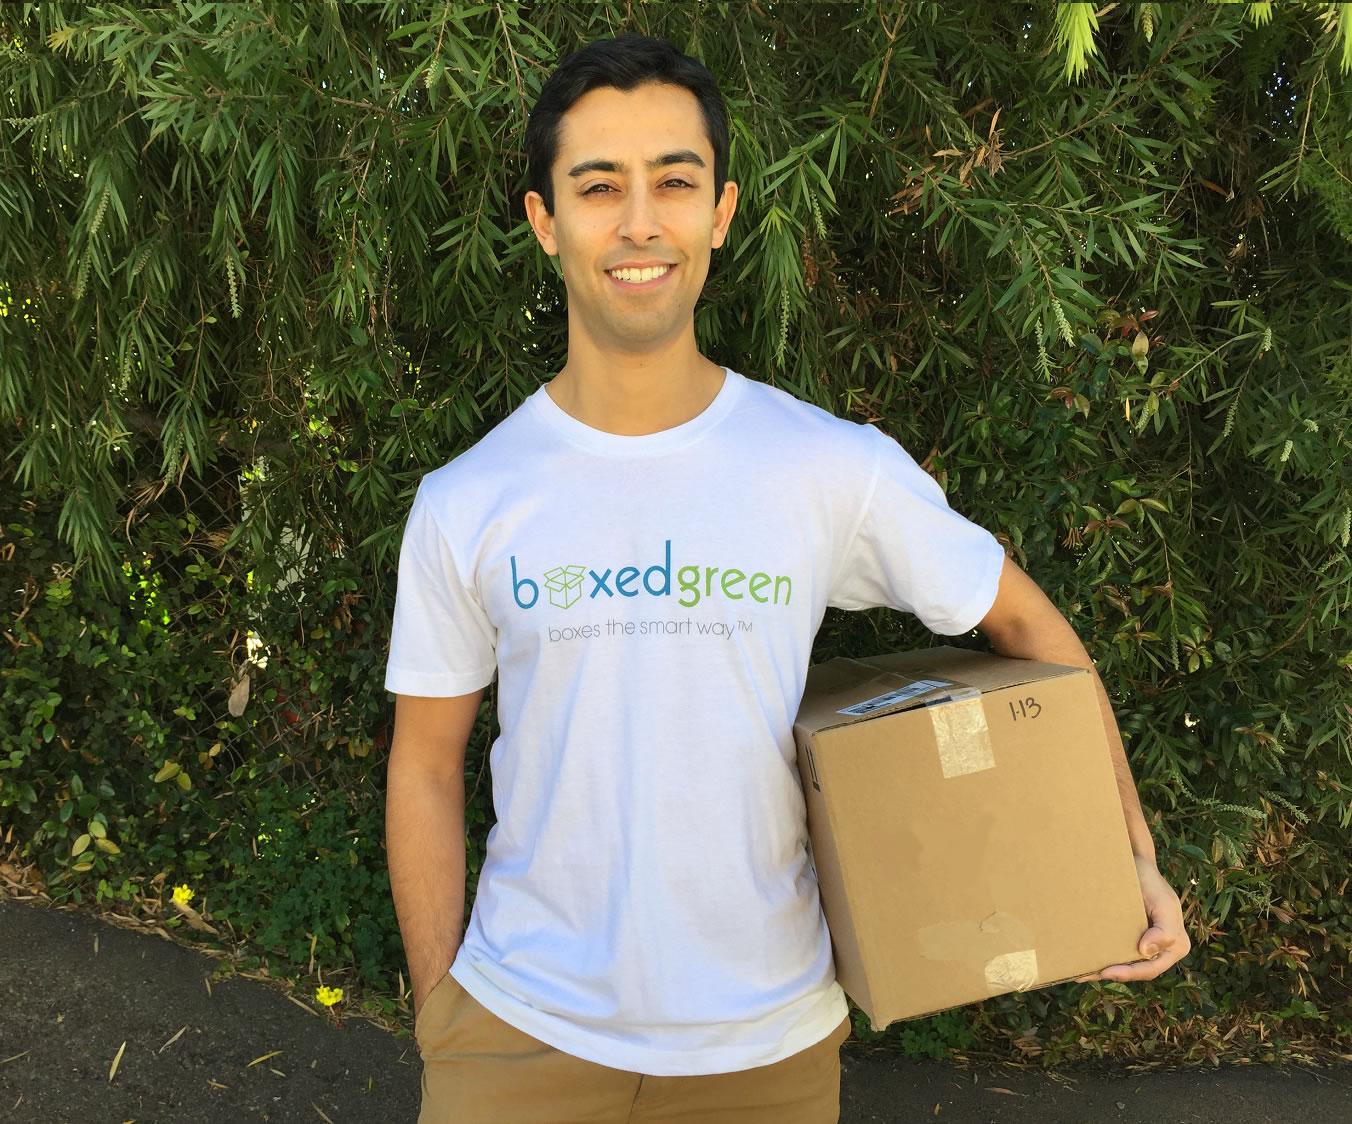 BoxedGreen Founder